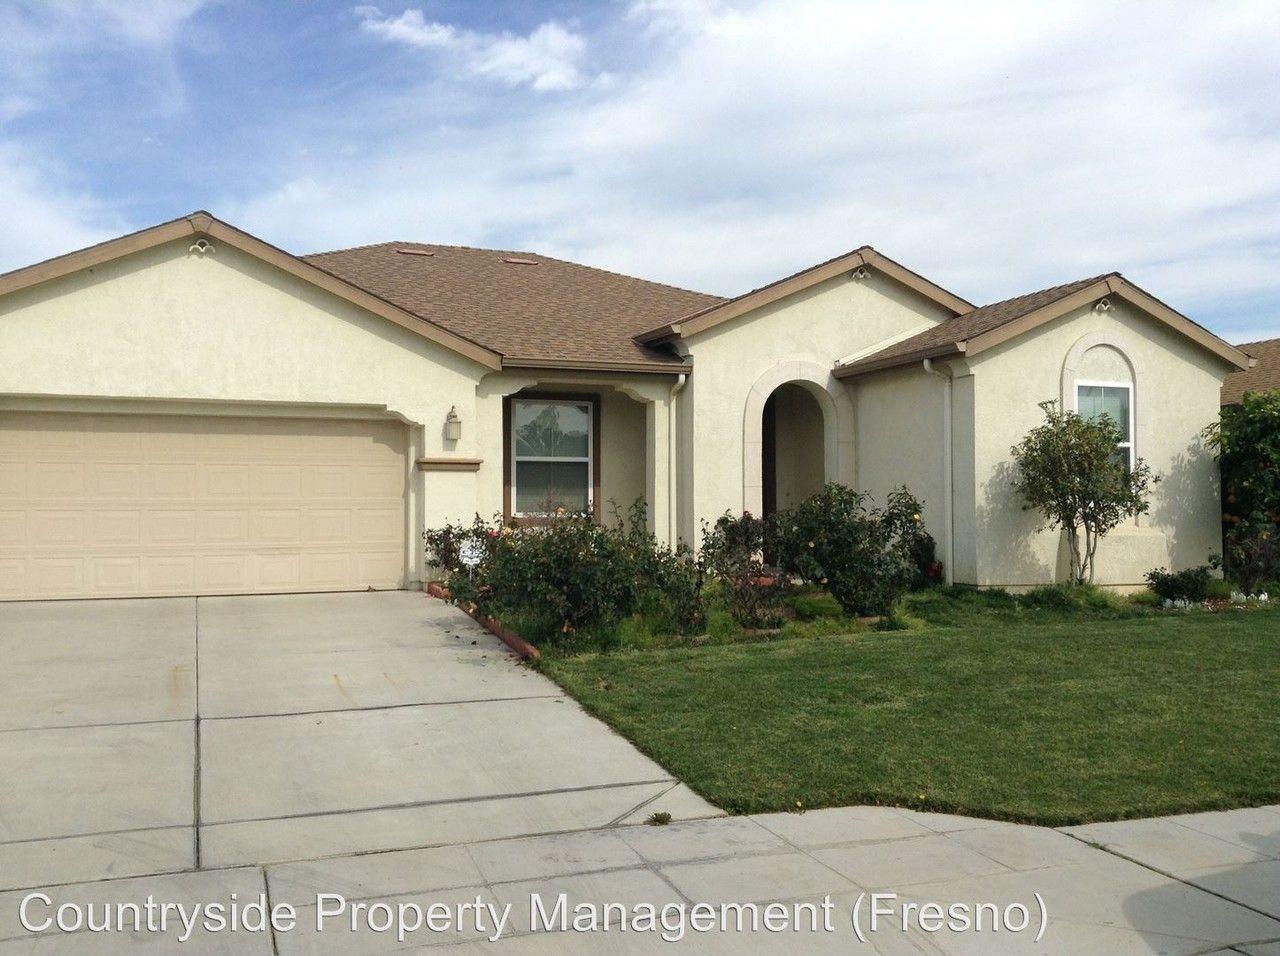 5162 W. Home Avenue, Fresno, CA 93722 3 Bedroom House for ...